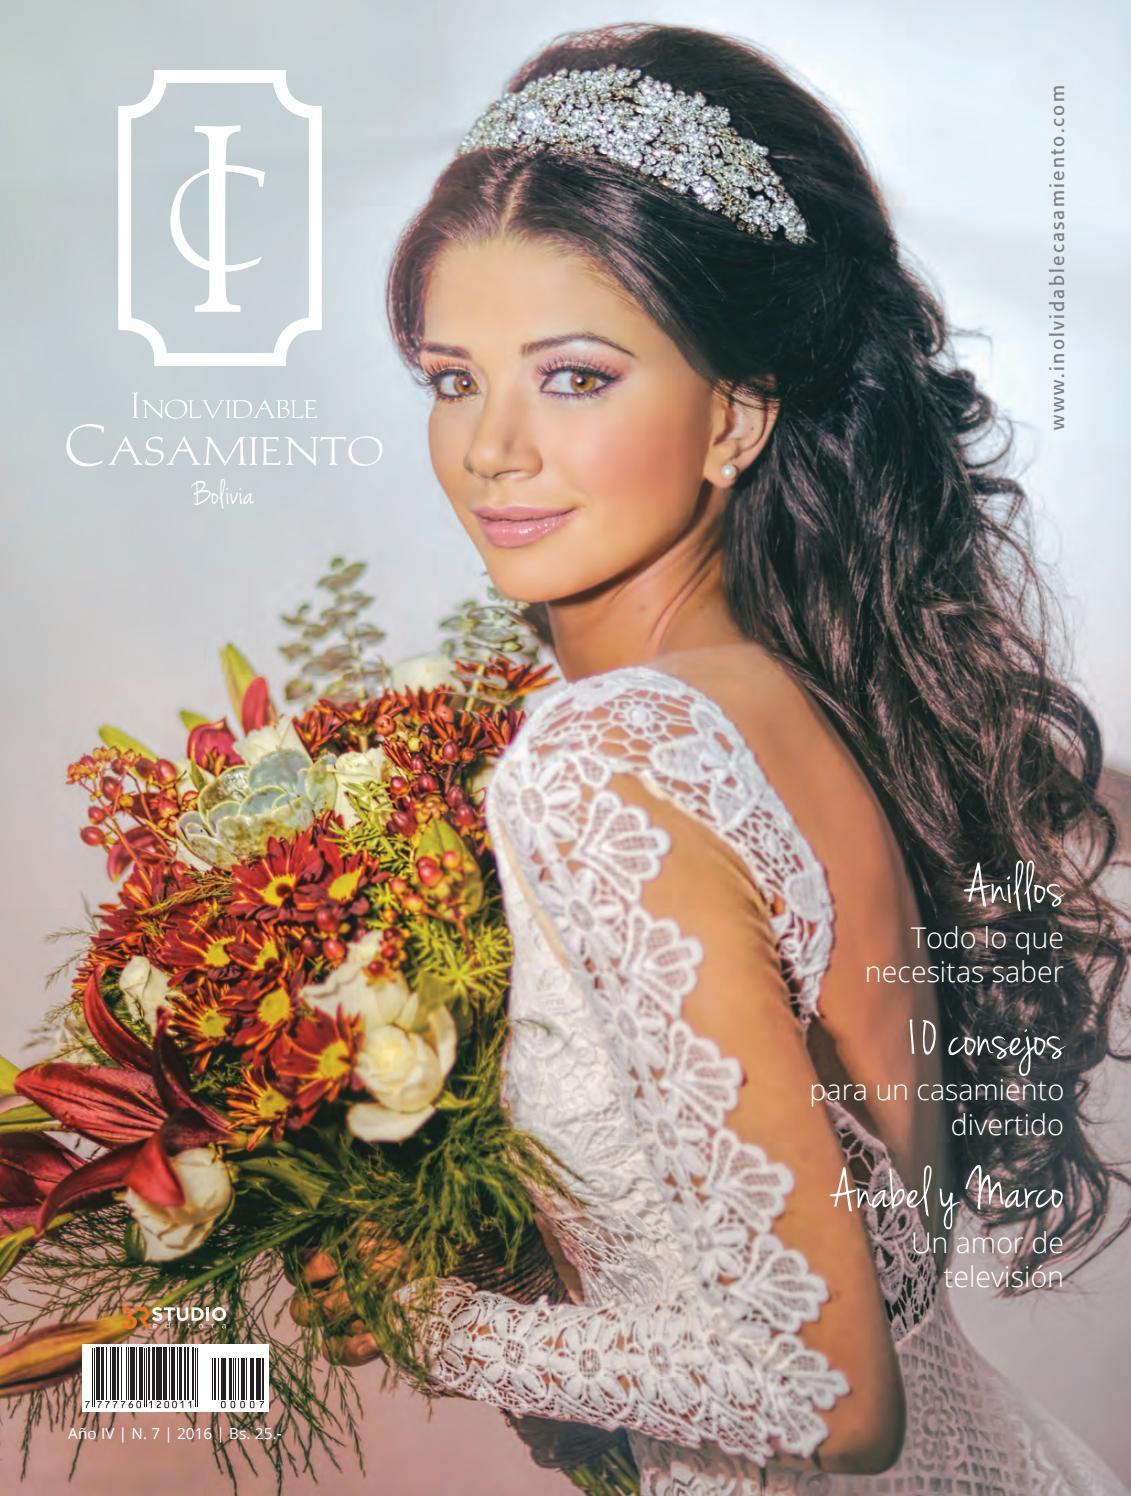 04c7c7a3ba Inolvidable Casamiento 07 by Inolvidable Casamiento Bolívia - issuu